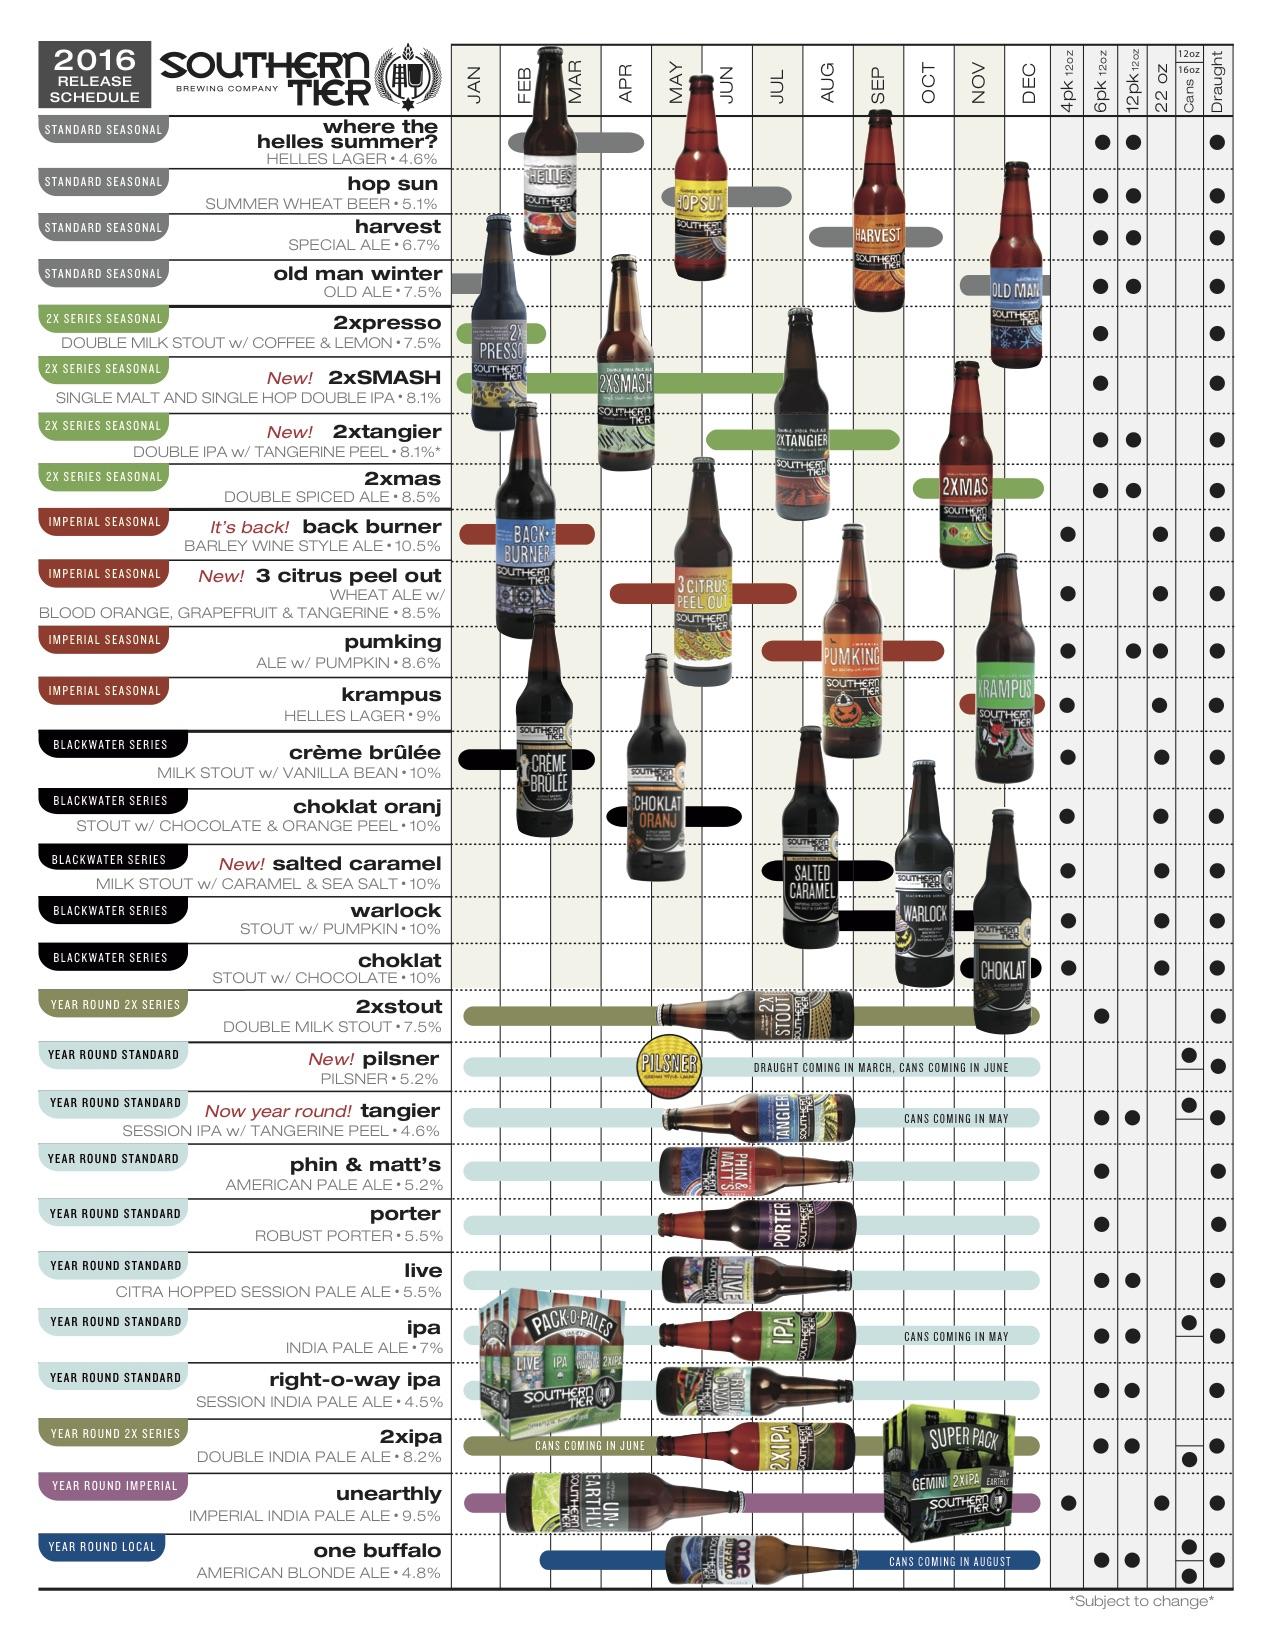 2016 Southern Tier Brewing Craft Beer Release Calendar